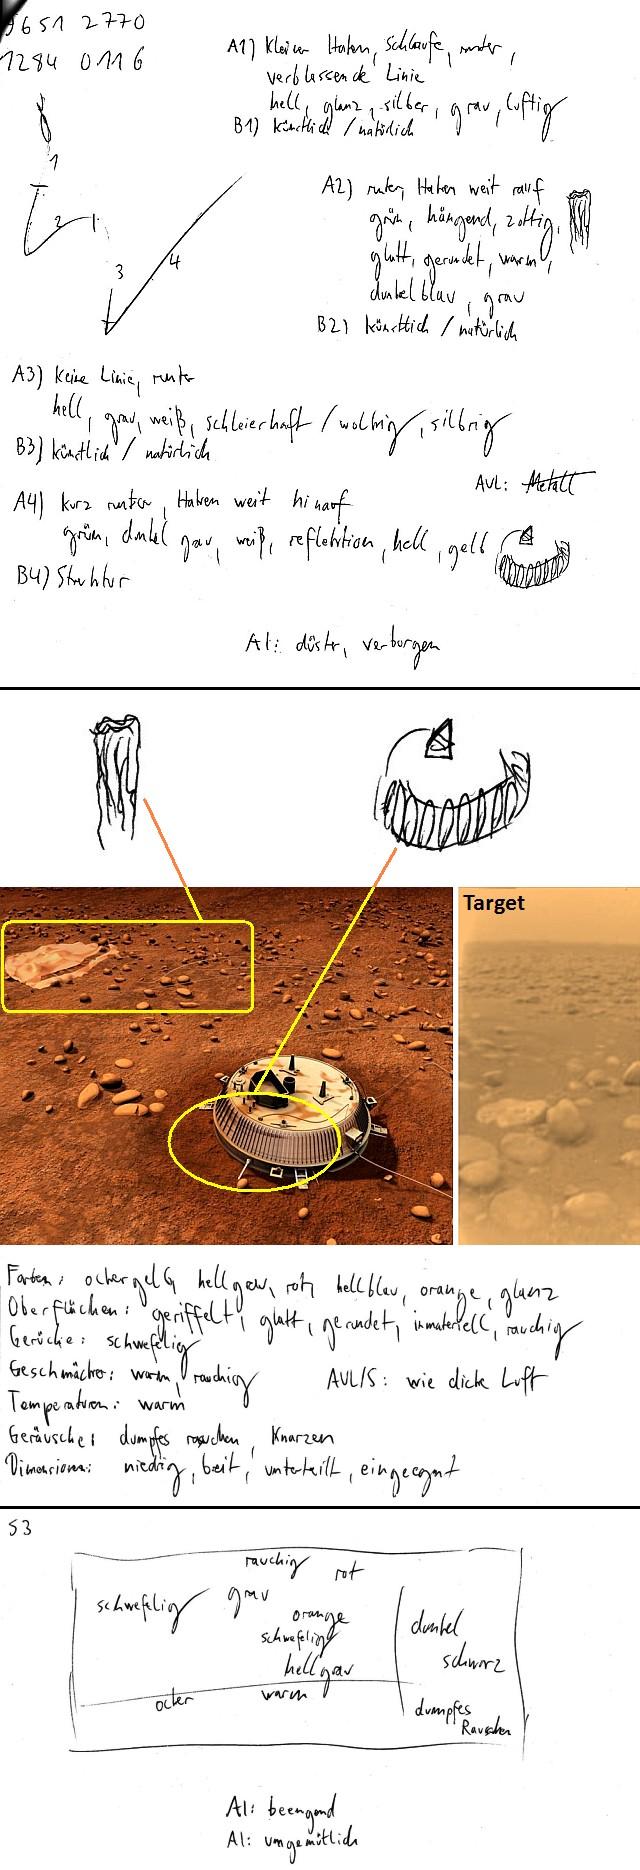 Titan-Huygens